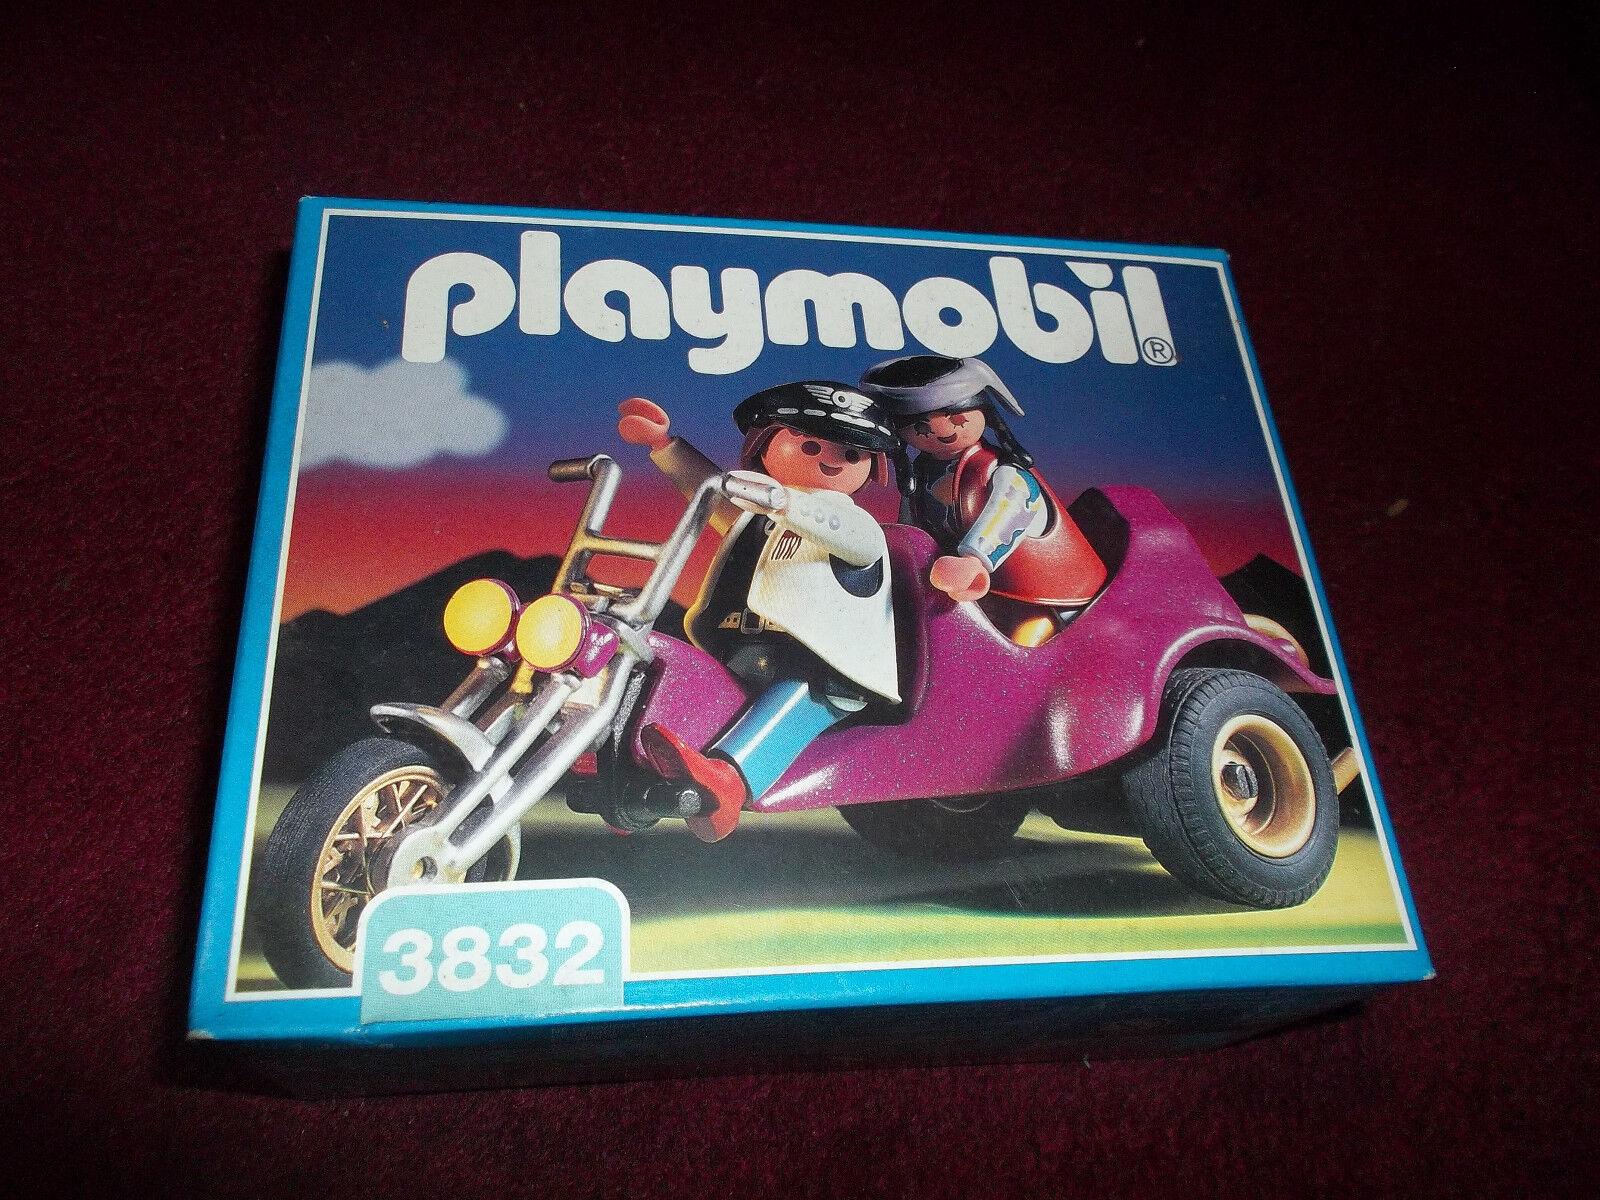 Playmobil 3832 Trike RARITÄTneu und original verpackt